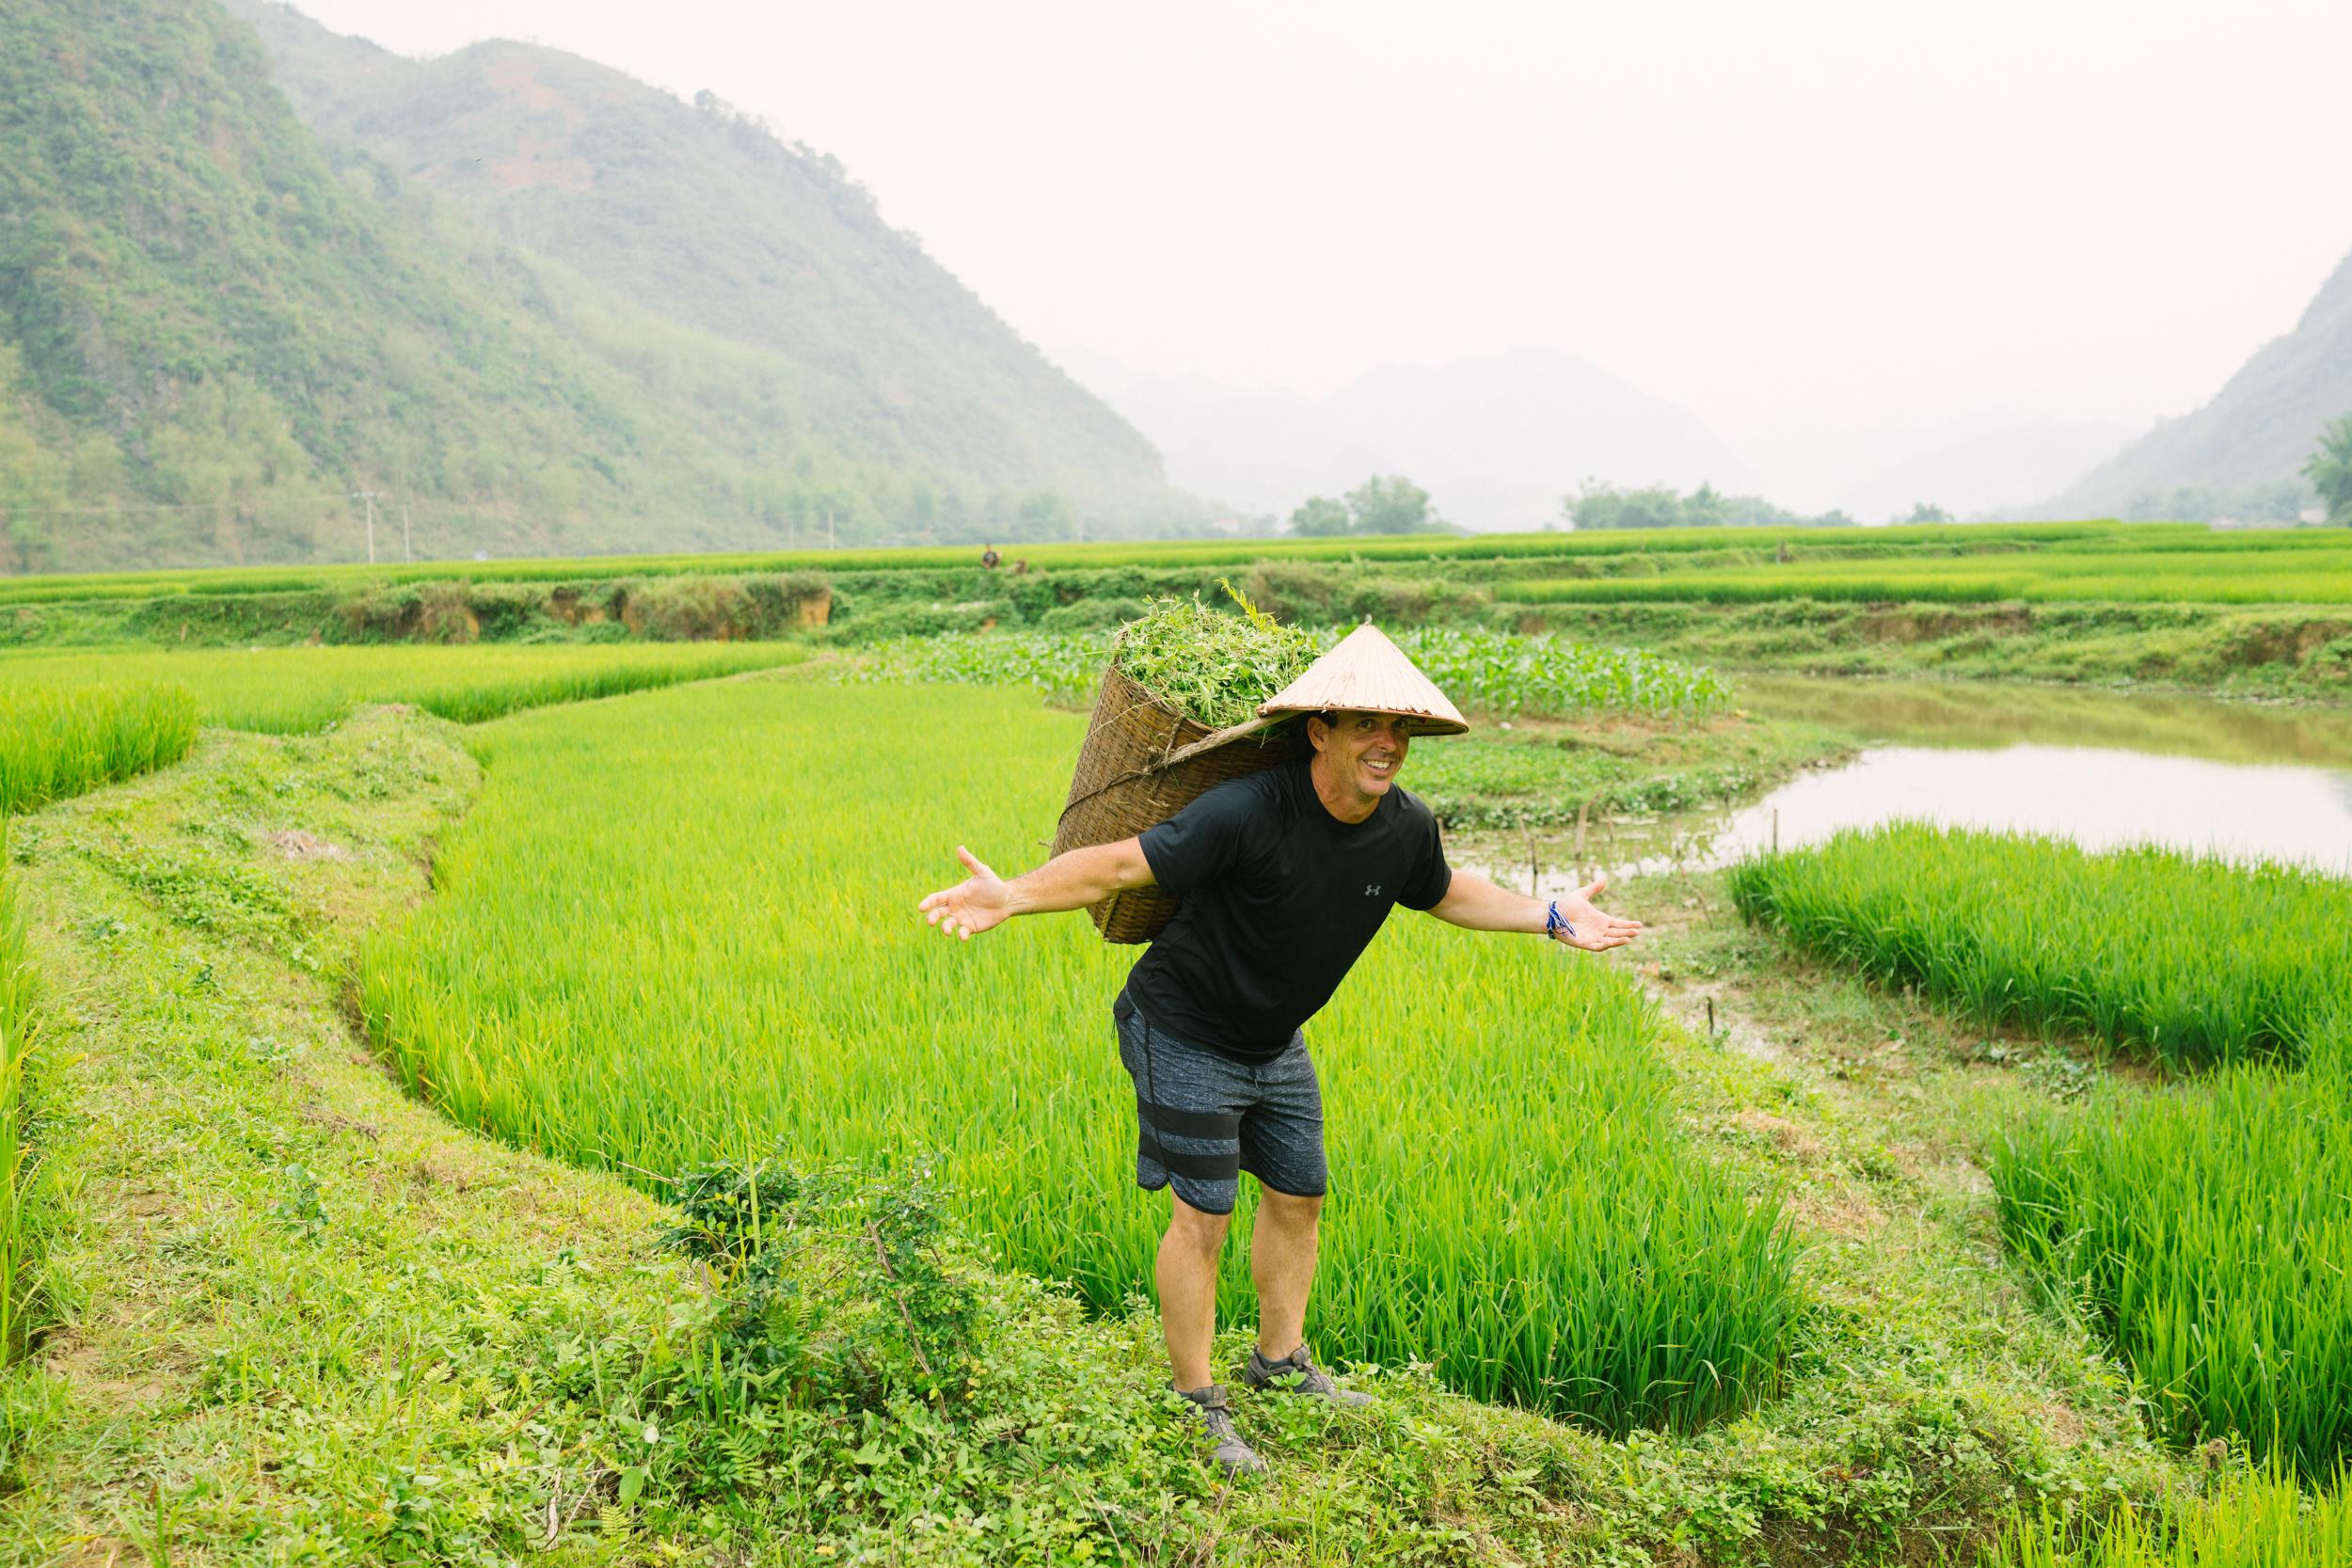 vietnam-project-apr-2015_0125.jpg